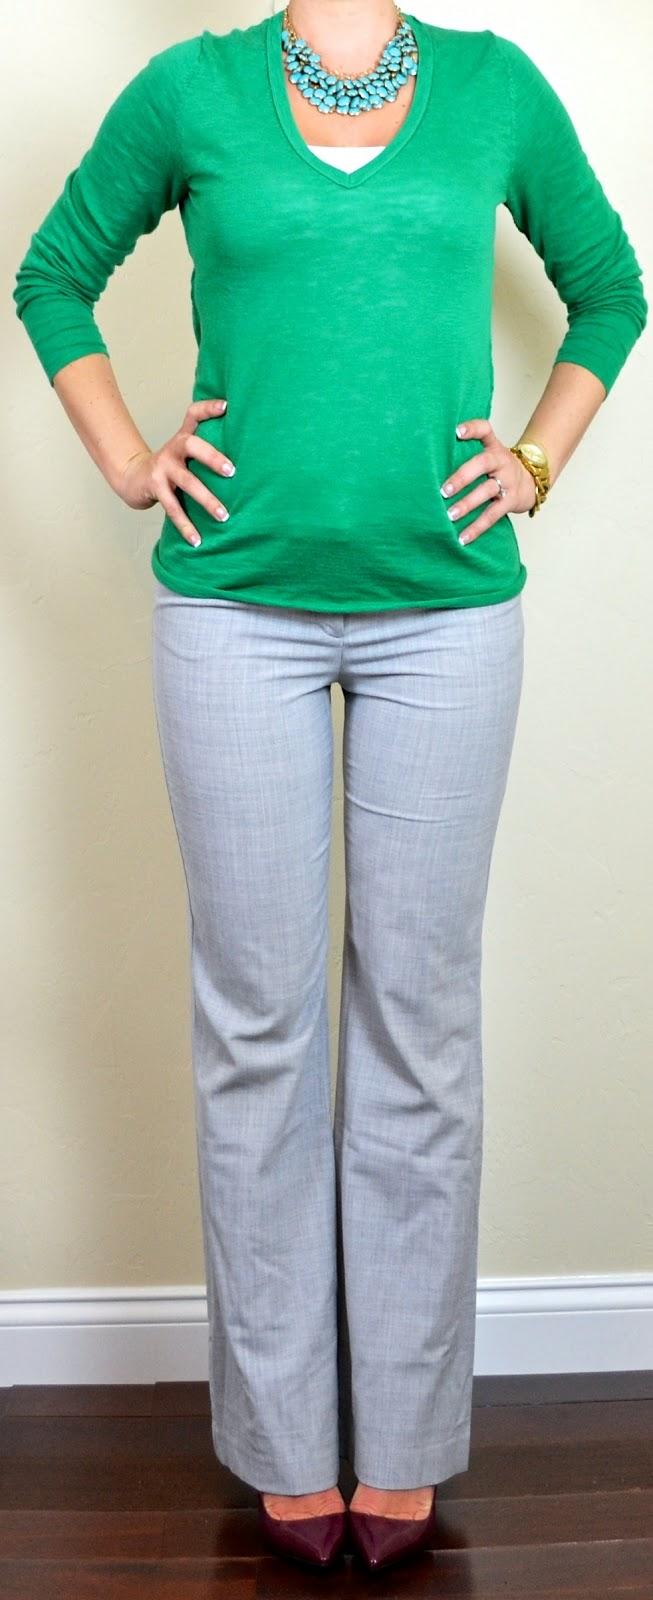 Outfit post kelly green sweater grey u2018editoru2019 pants burgundy pumps